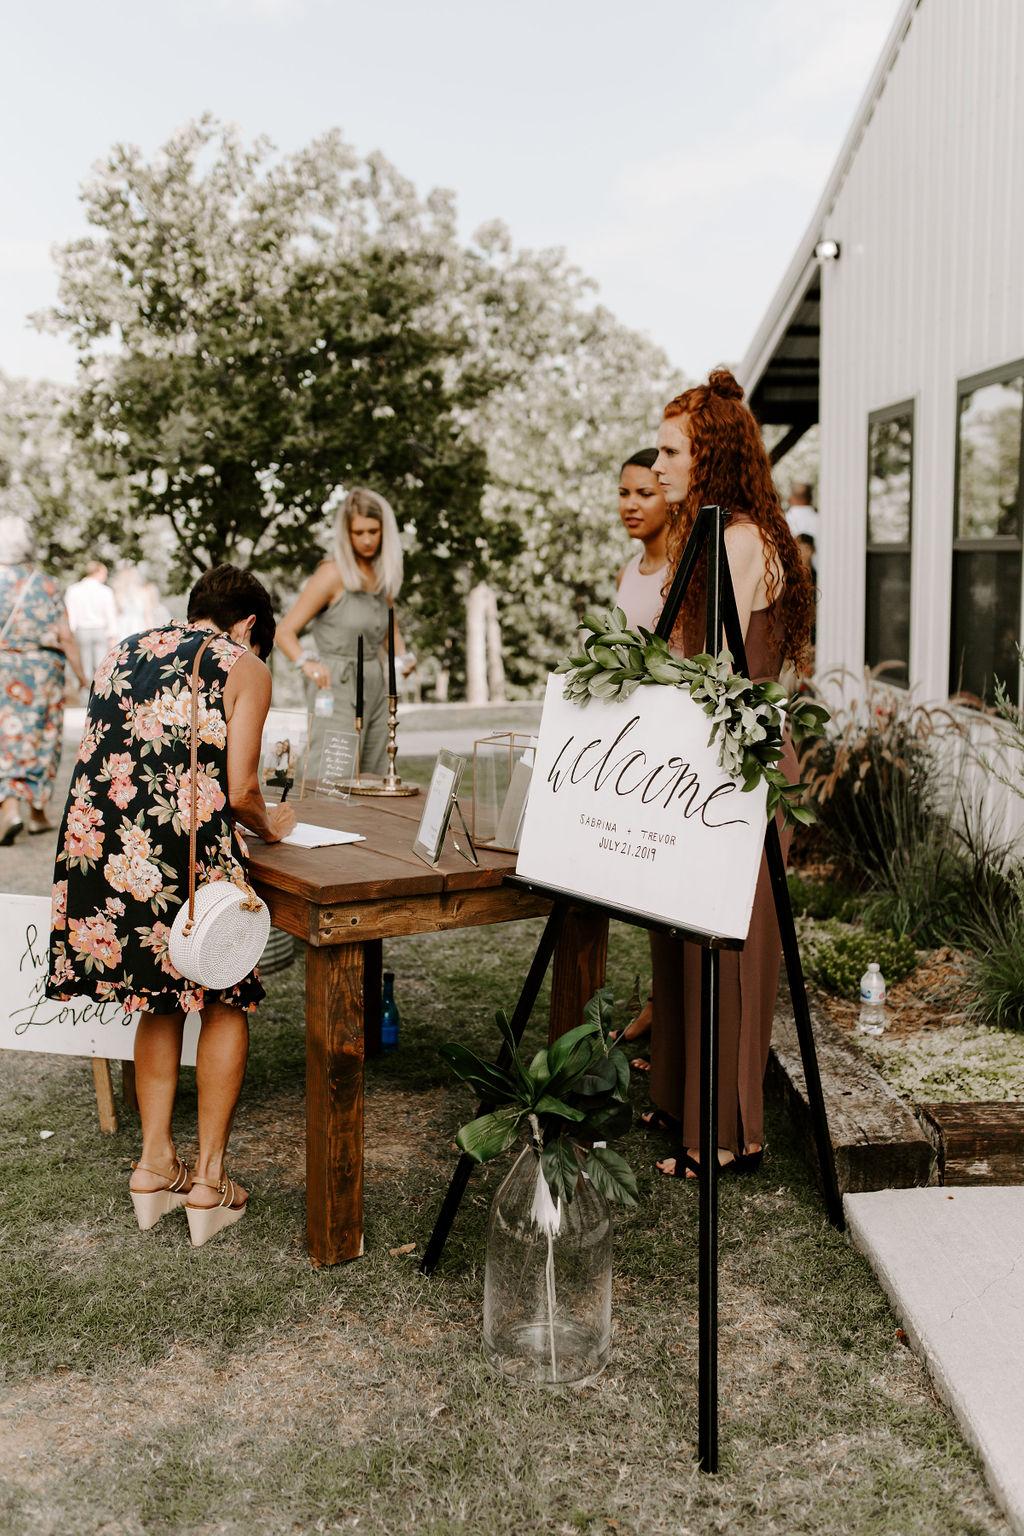 Tulsa White Barn Wedding Venue Outdoor Ceremony 63.jpg